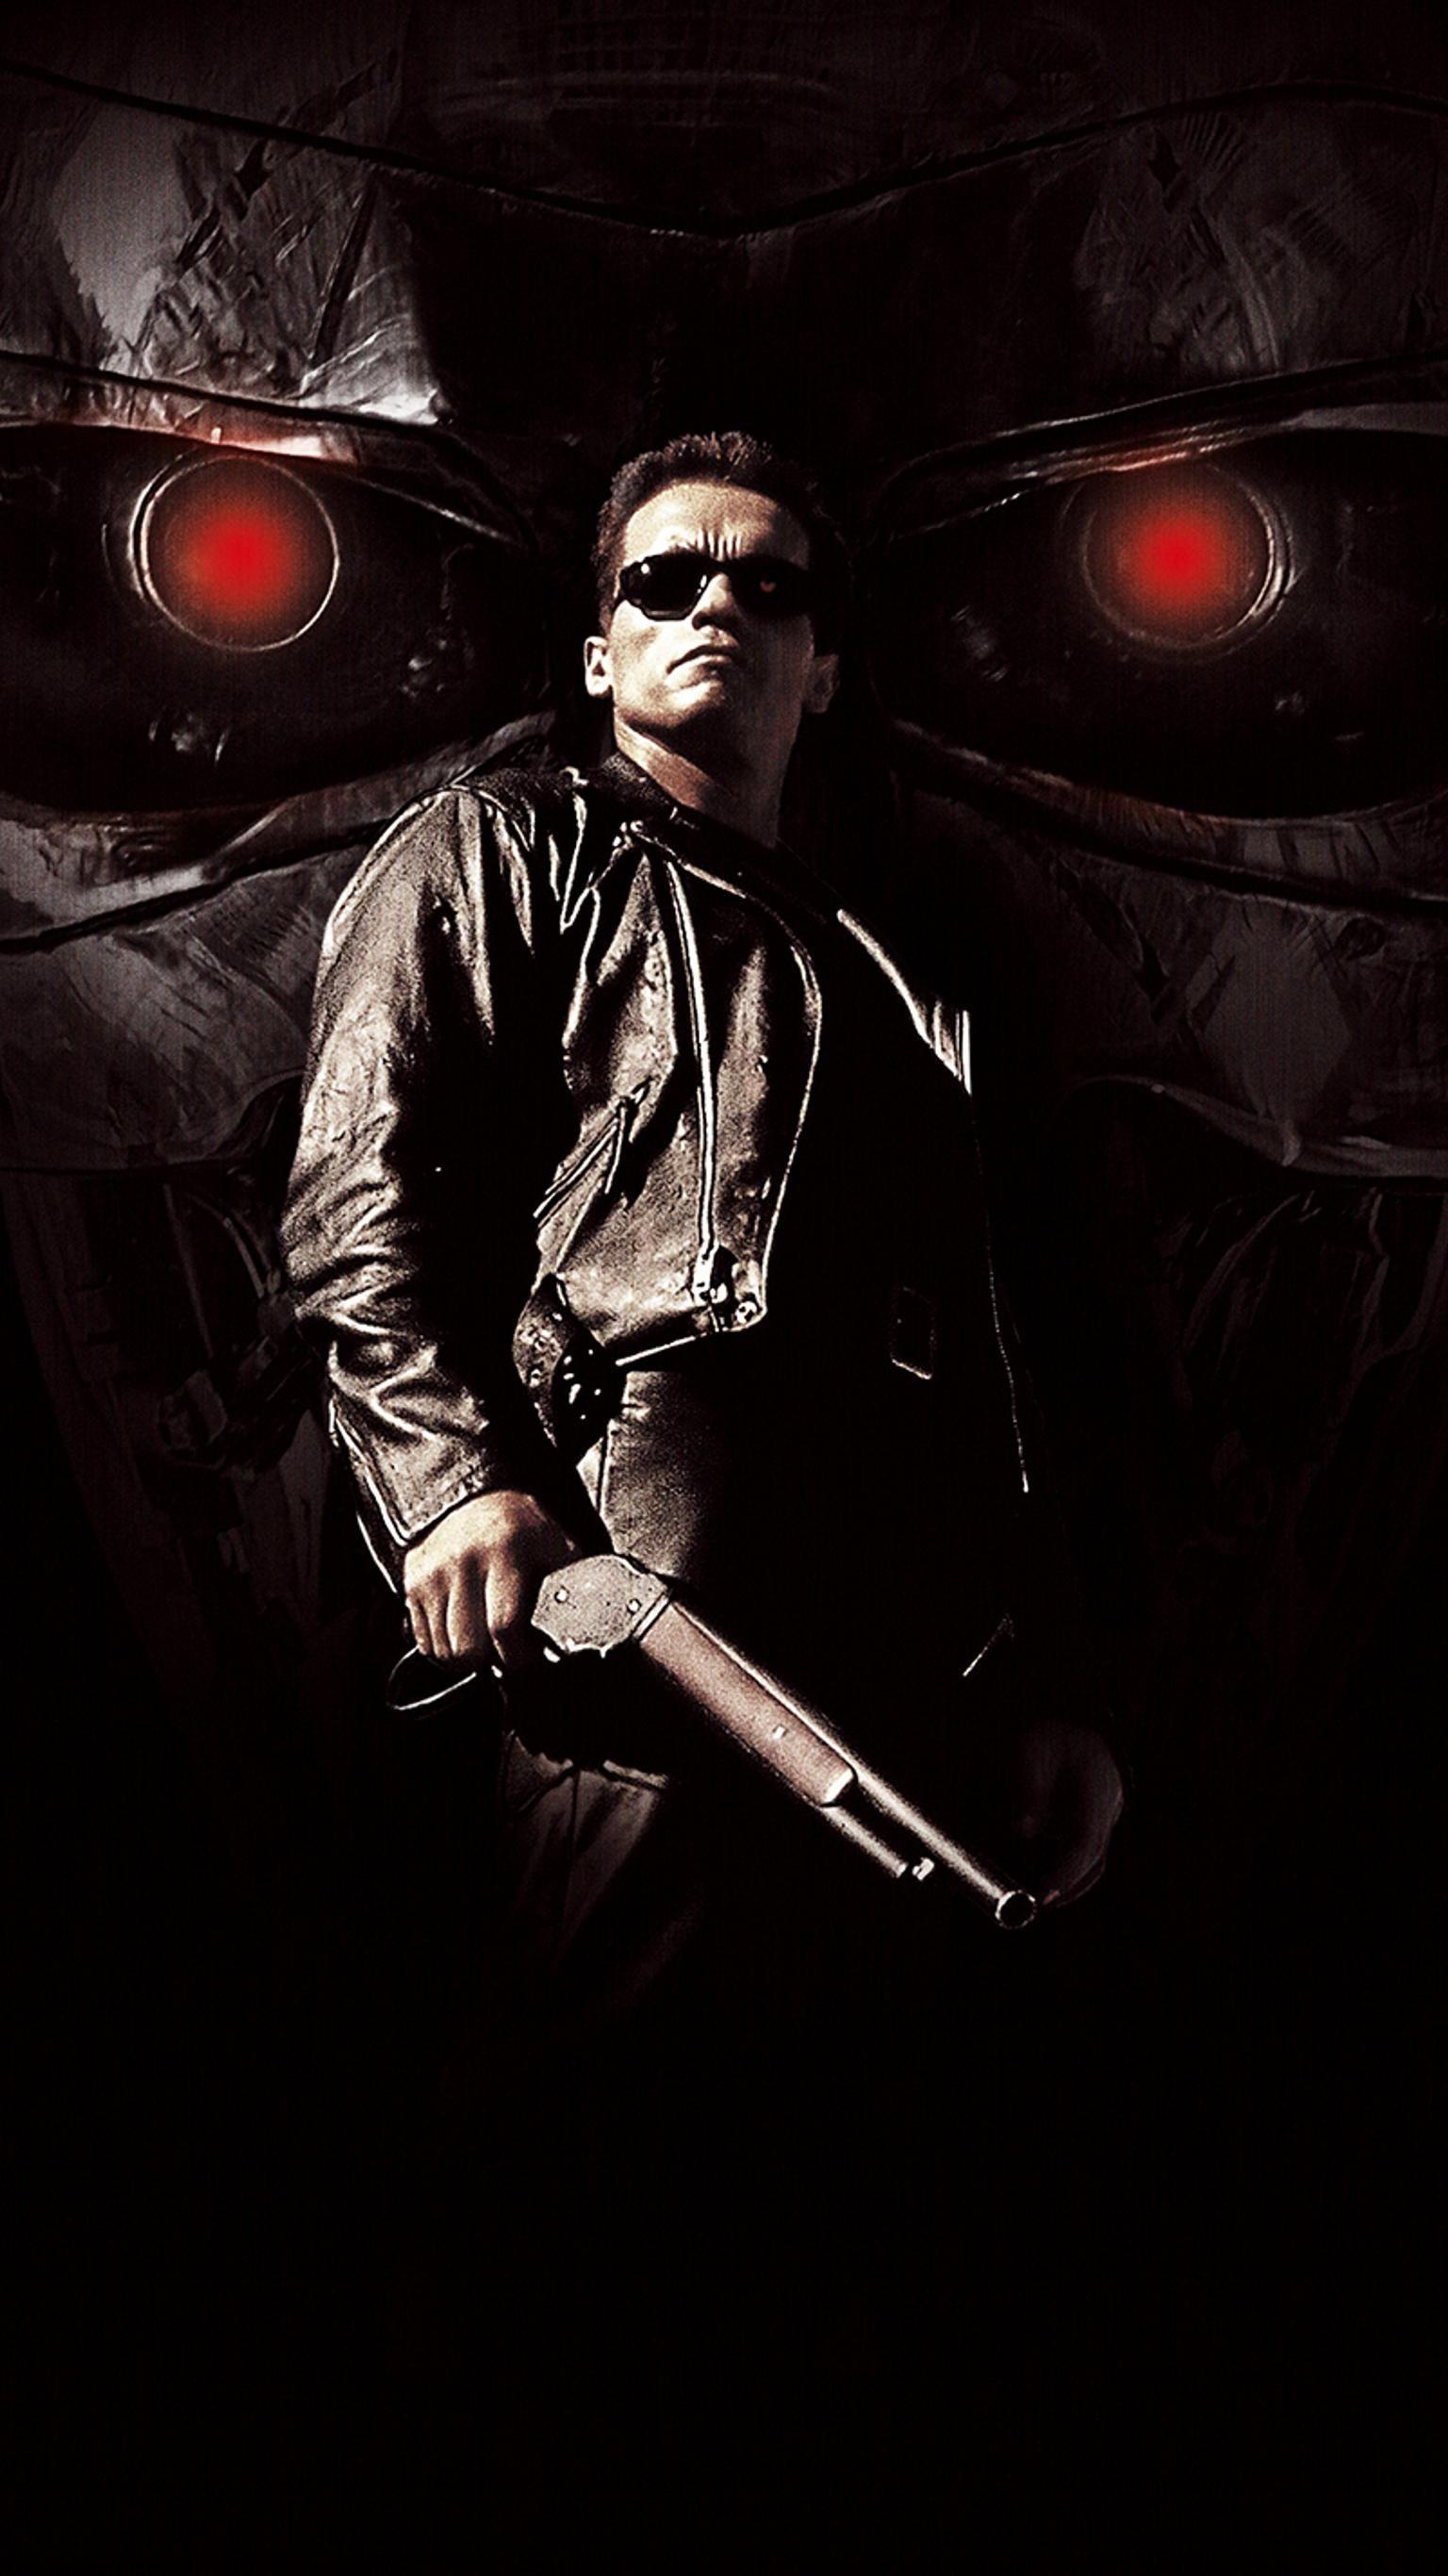 Res: 1536x2732, Terminator 2: Judgment Day (1991) Phone Wallpaper | Moviemania